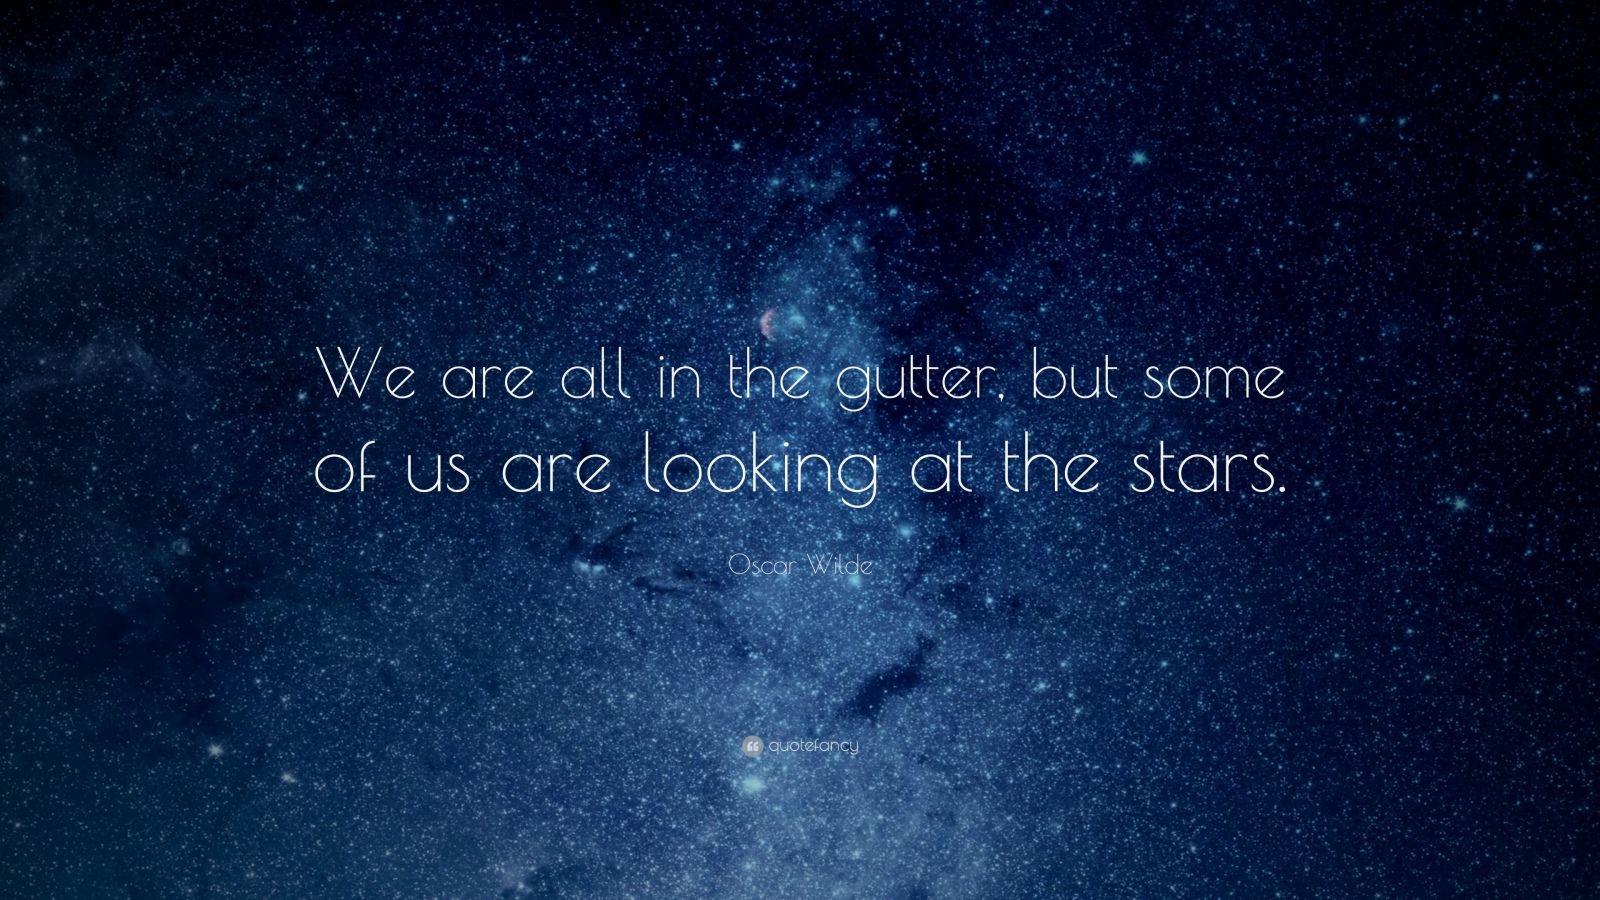 Oscar Wilde Quotes (34 wallpapers) - Quotefancy